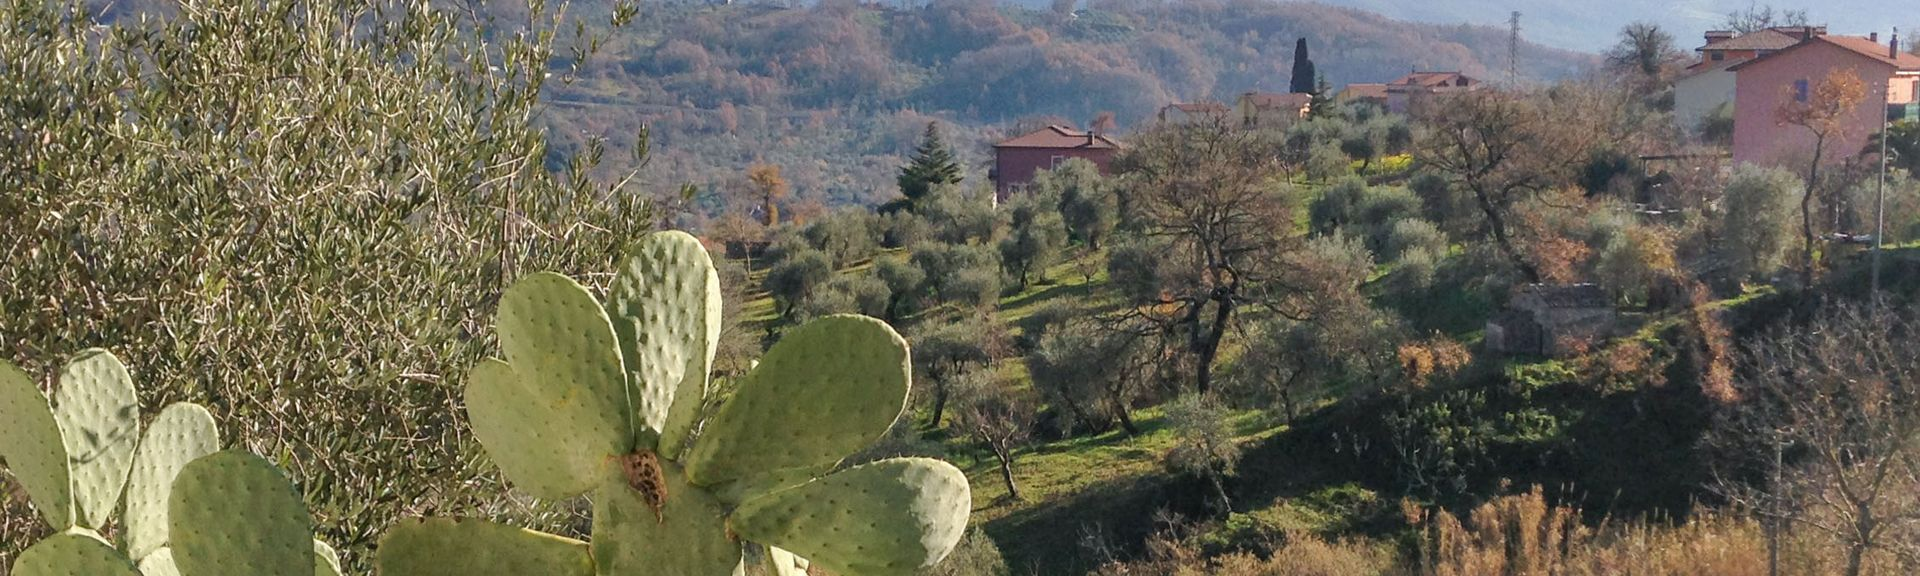 Acerno, Salerno, Campania, Italy